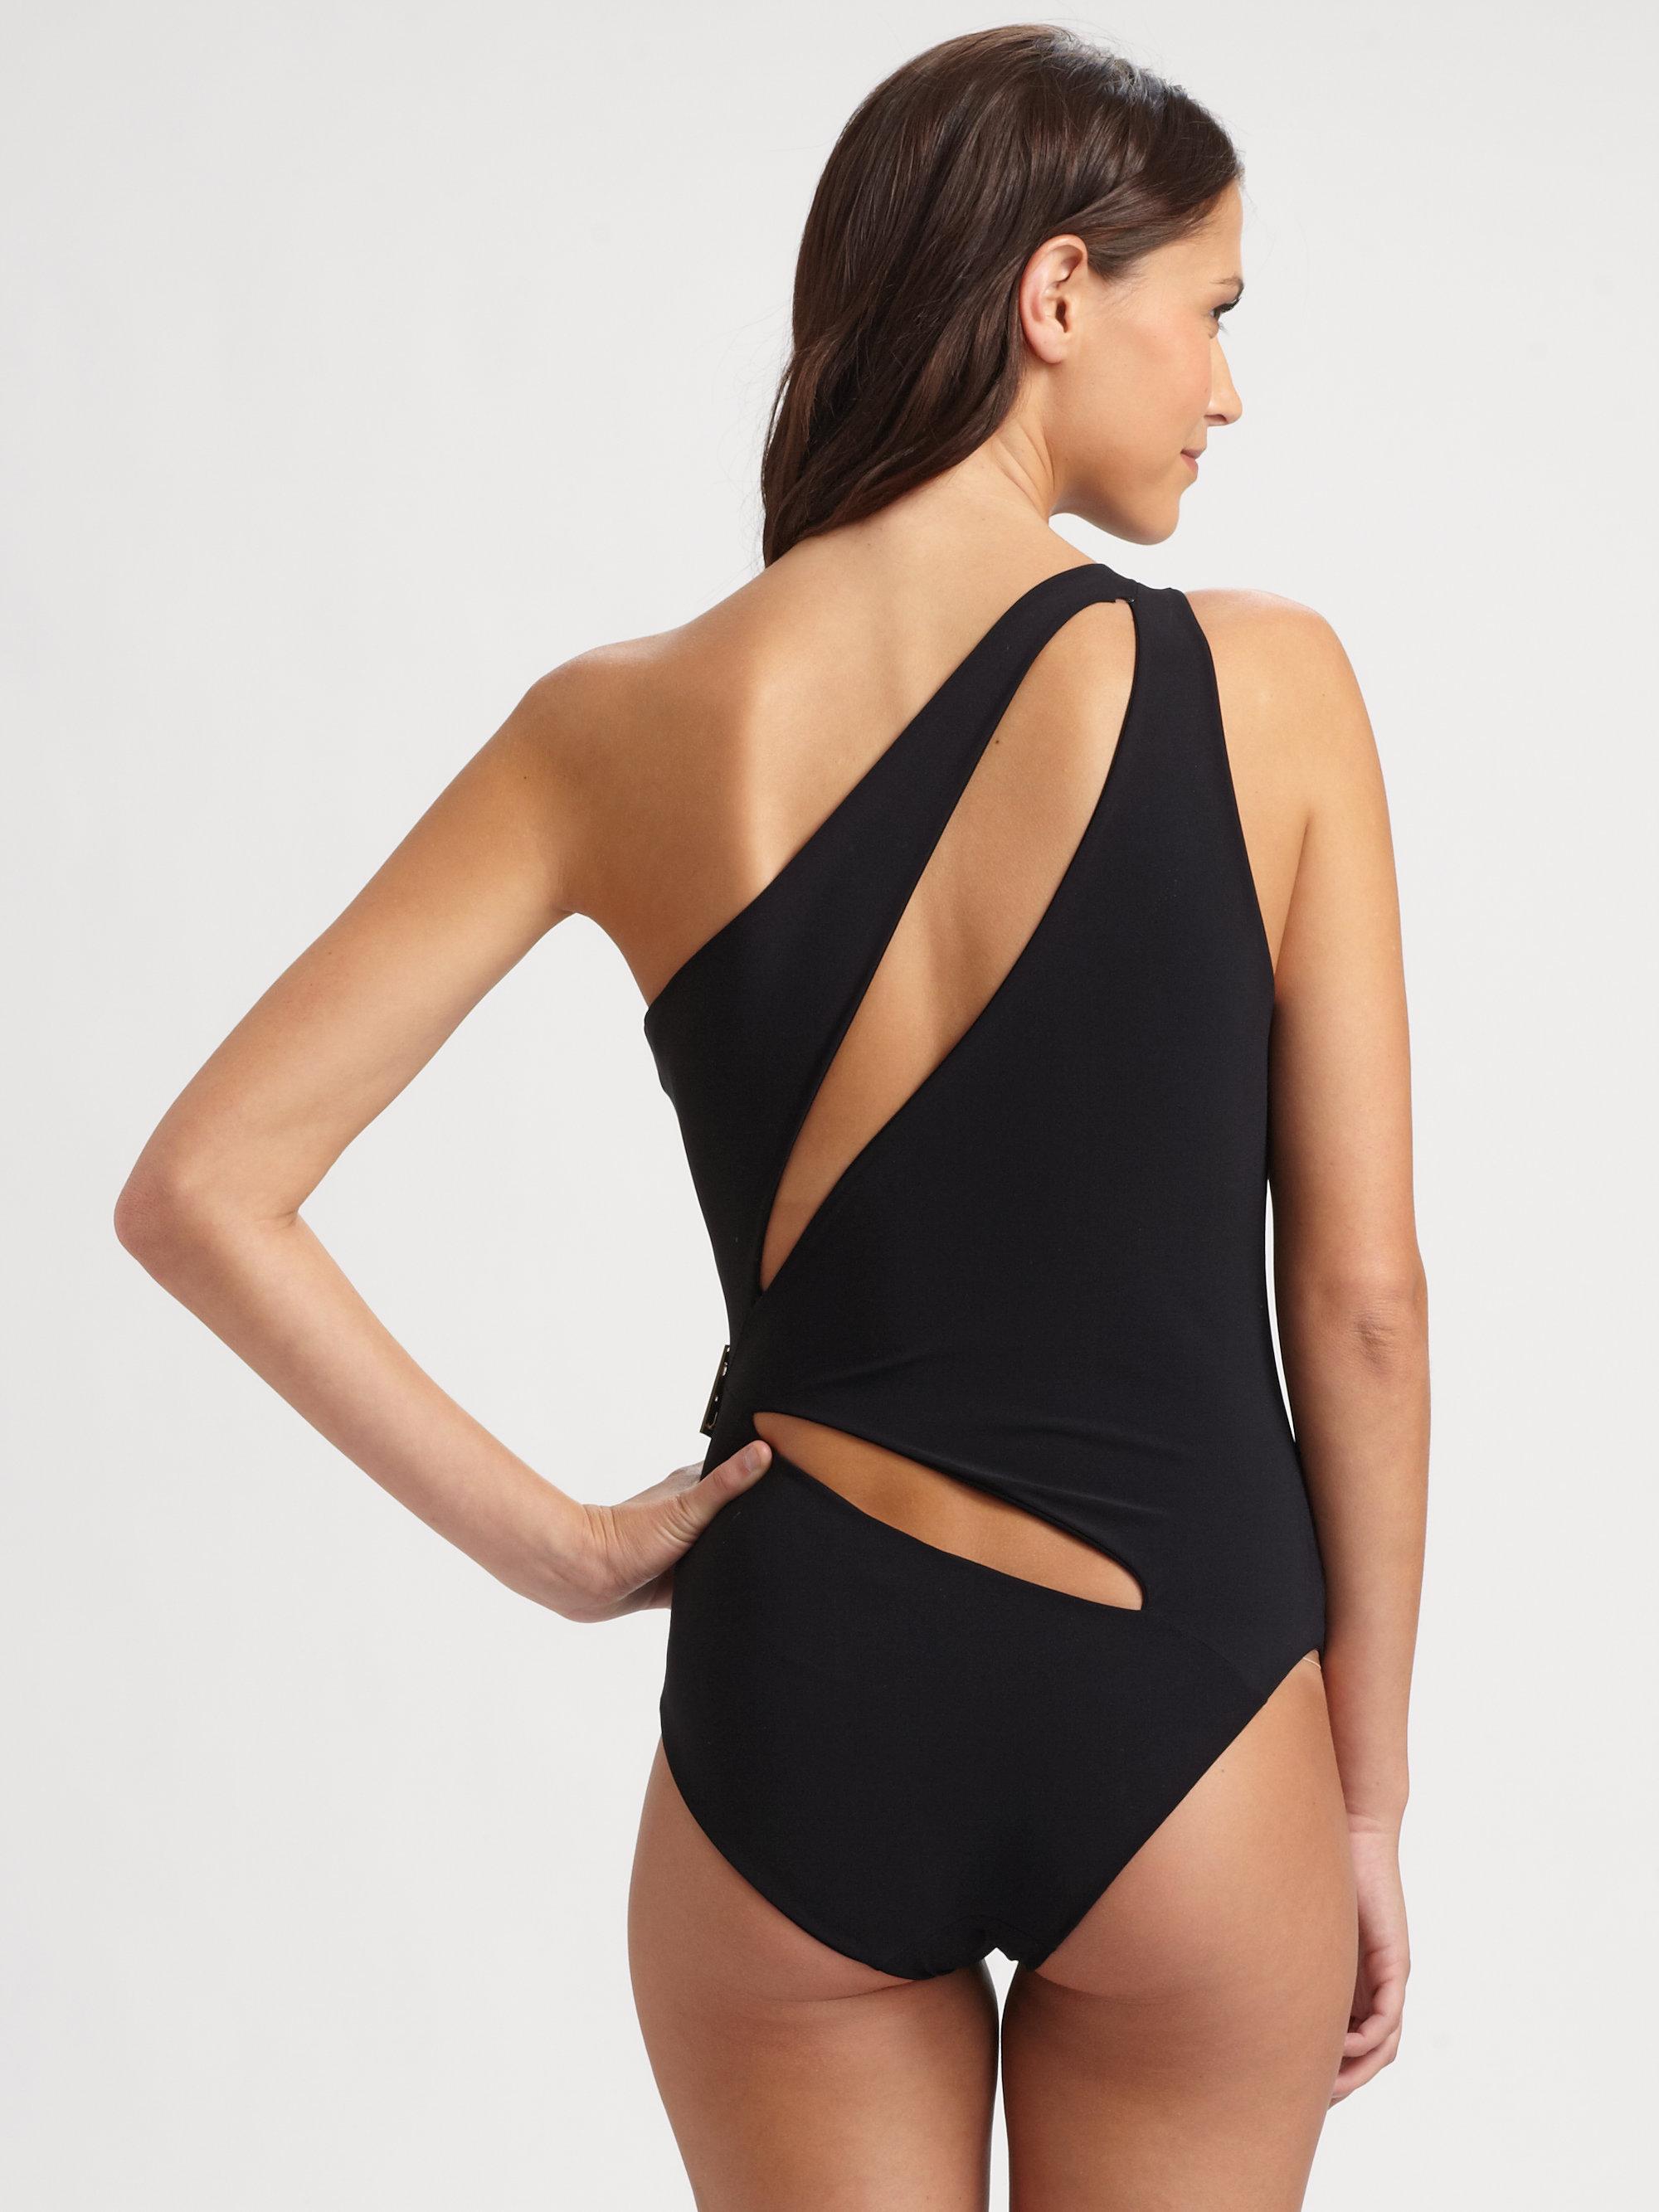 lyst emilio pucci one piece cutout swimsuit in black